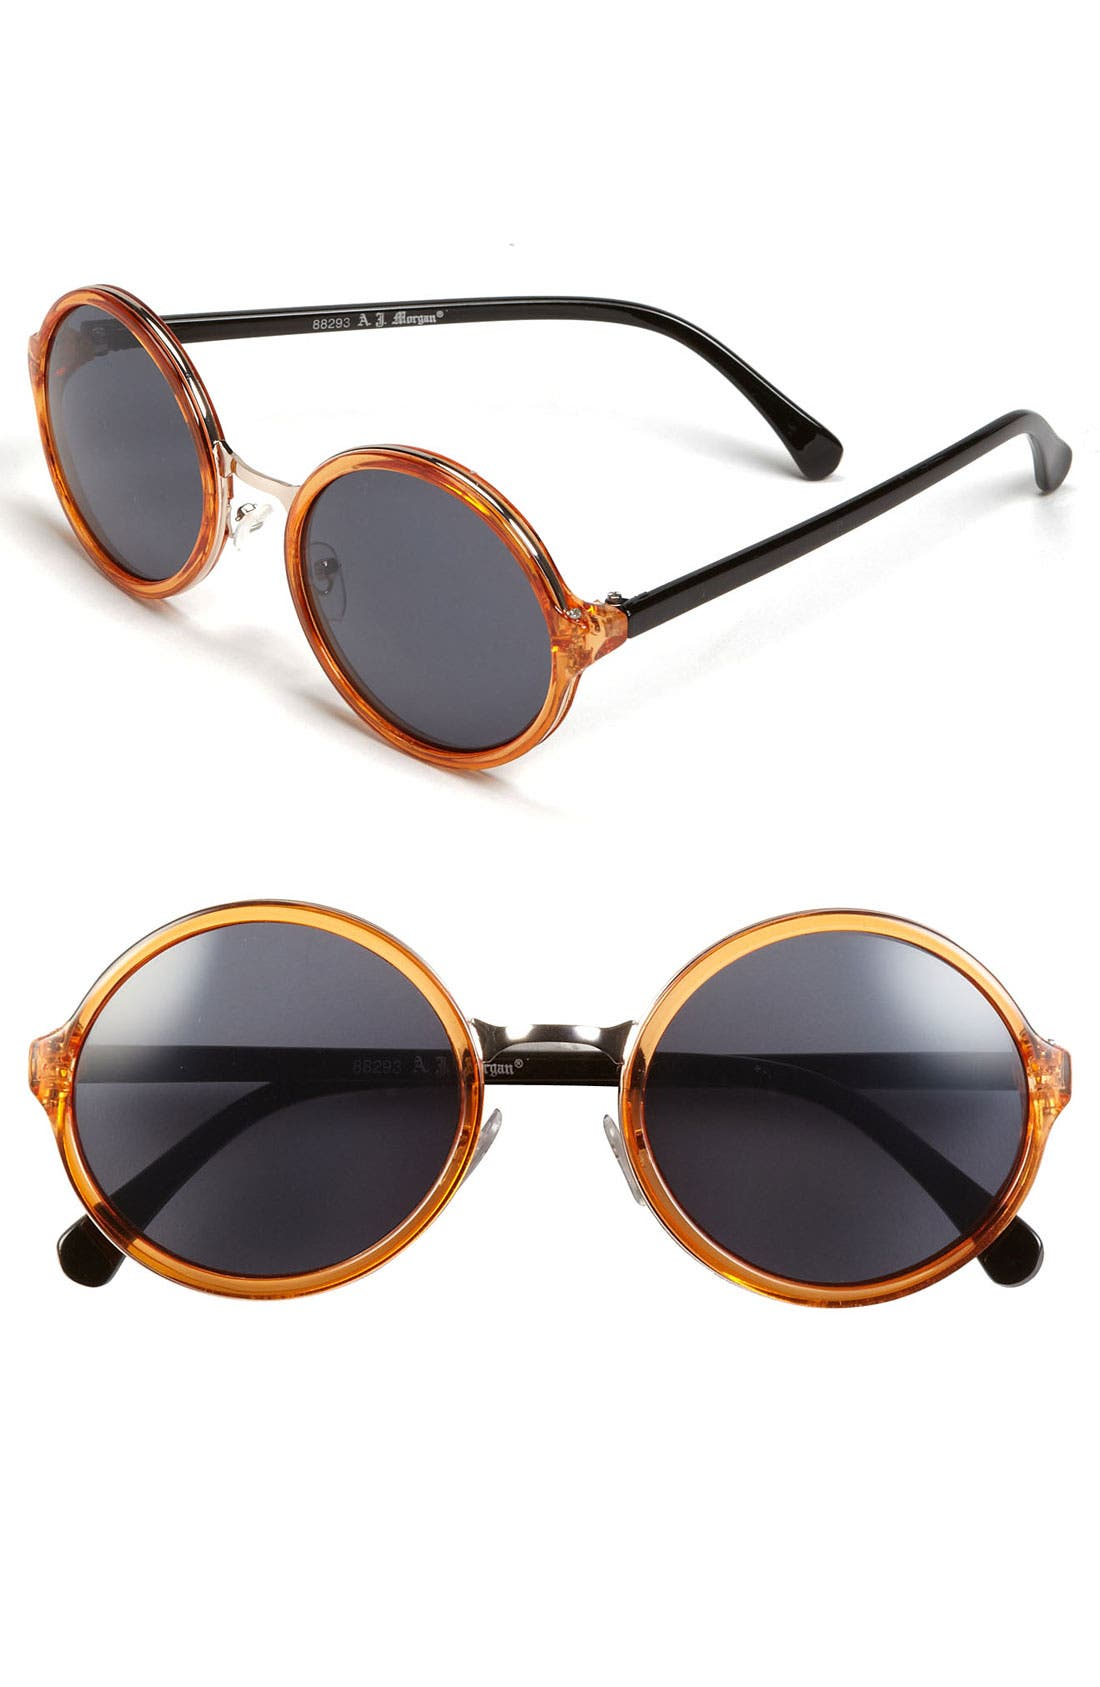 Main Image - A.J. Morgan 52mm Retro Round Sunglasses